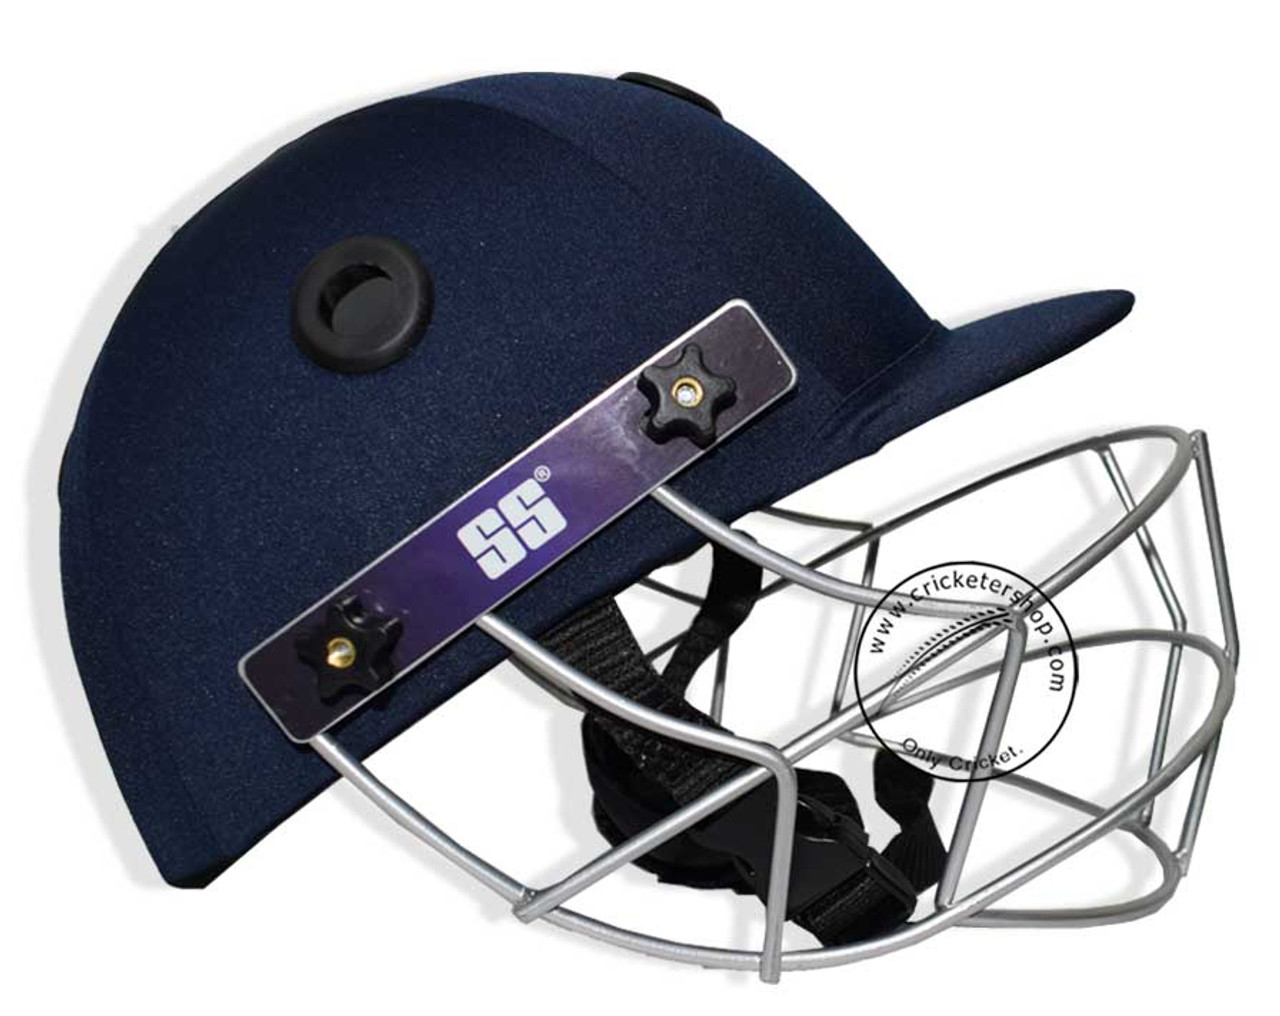 SS Professional Cricket Helmet